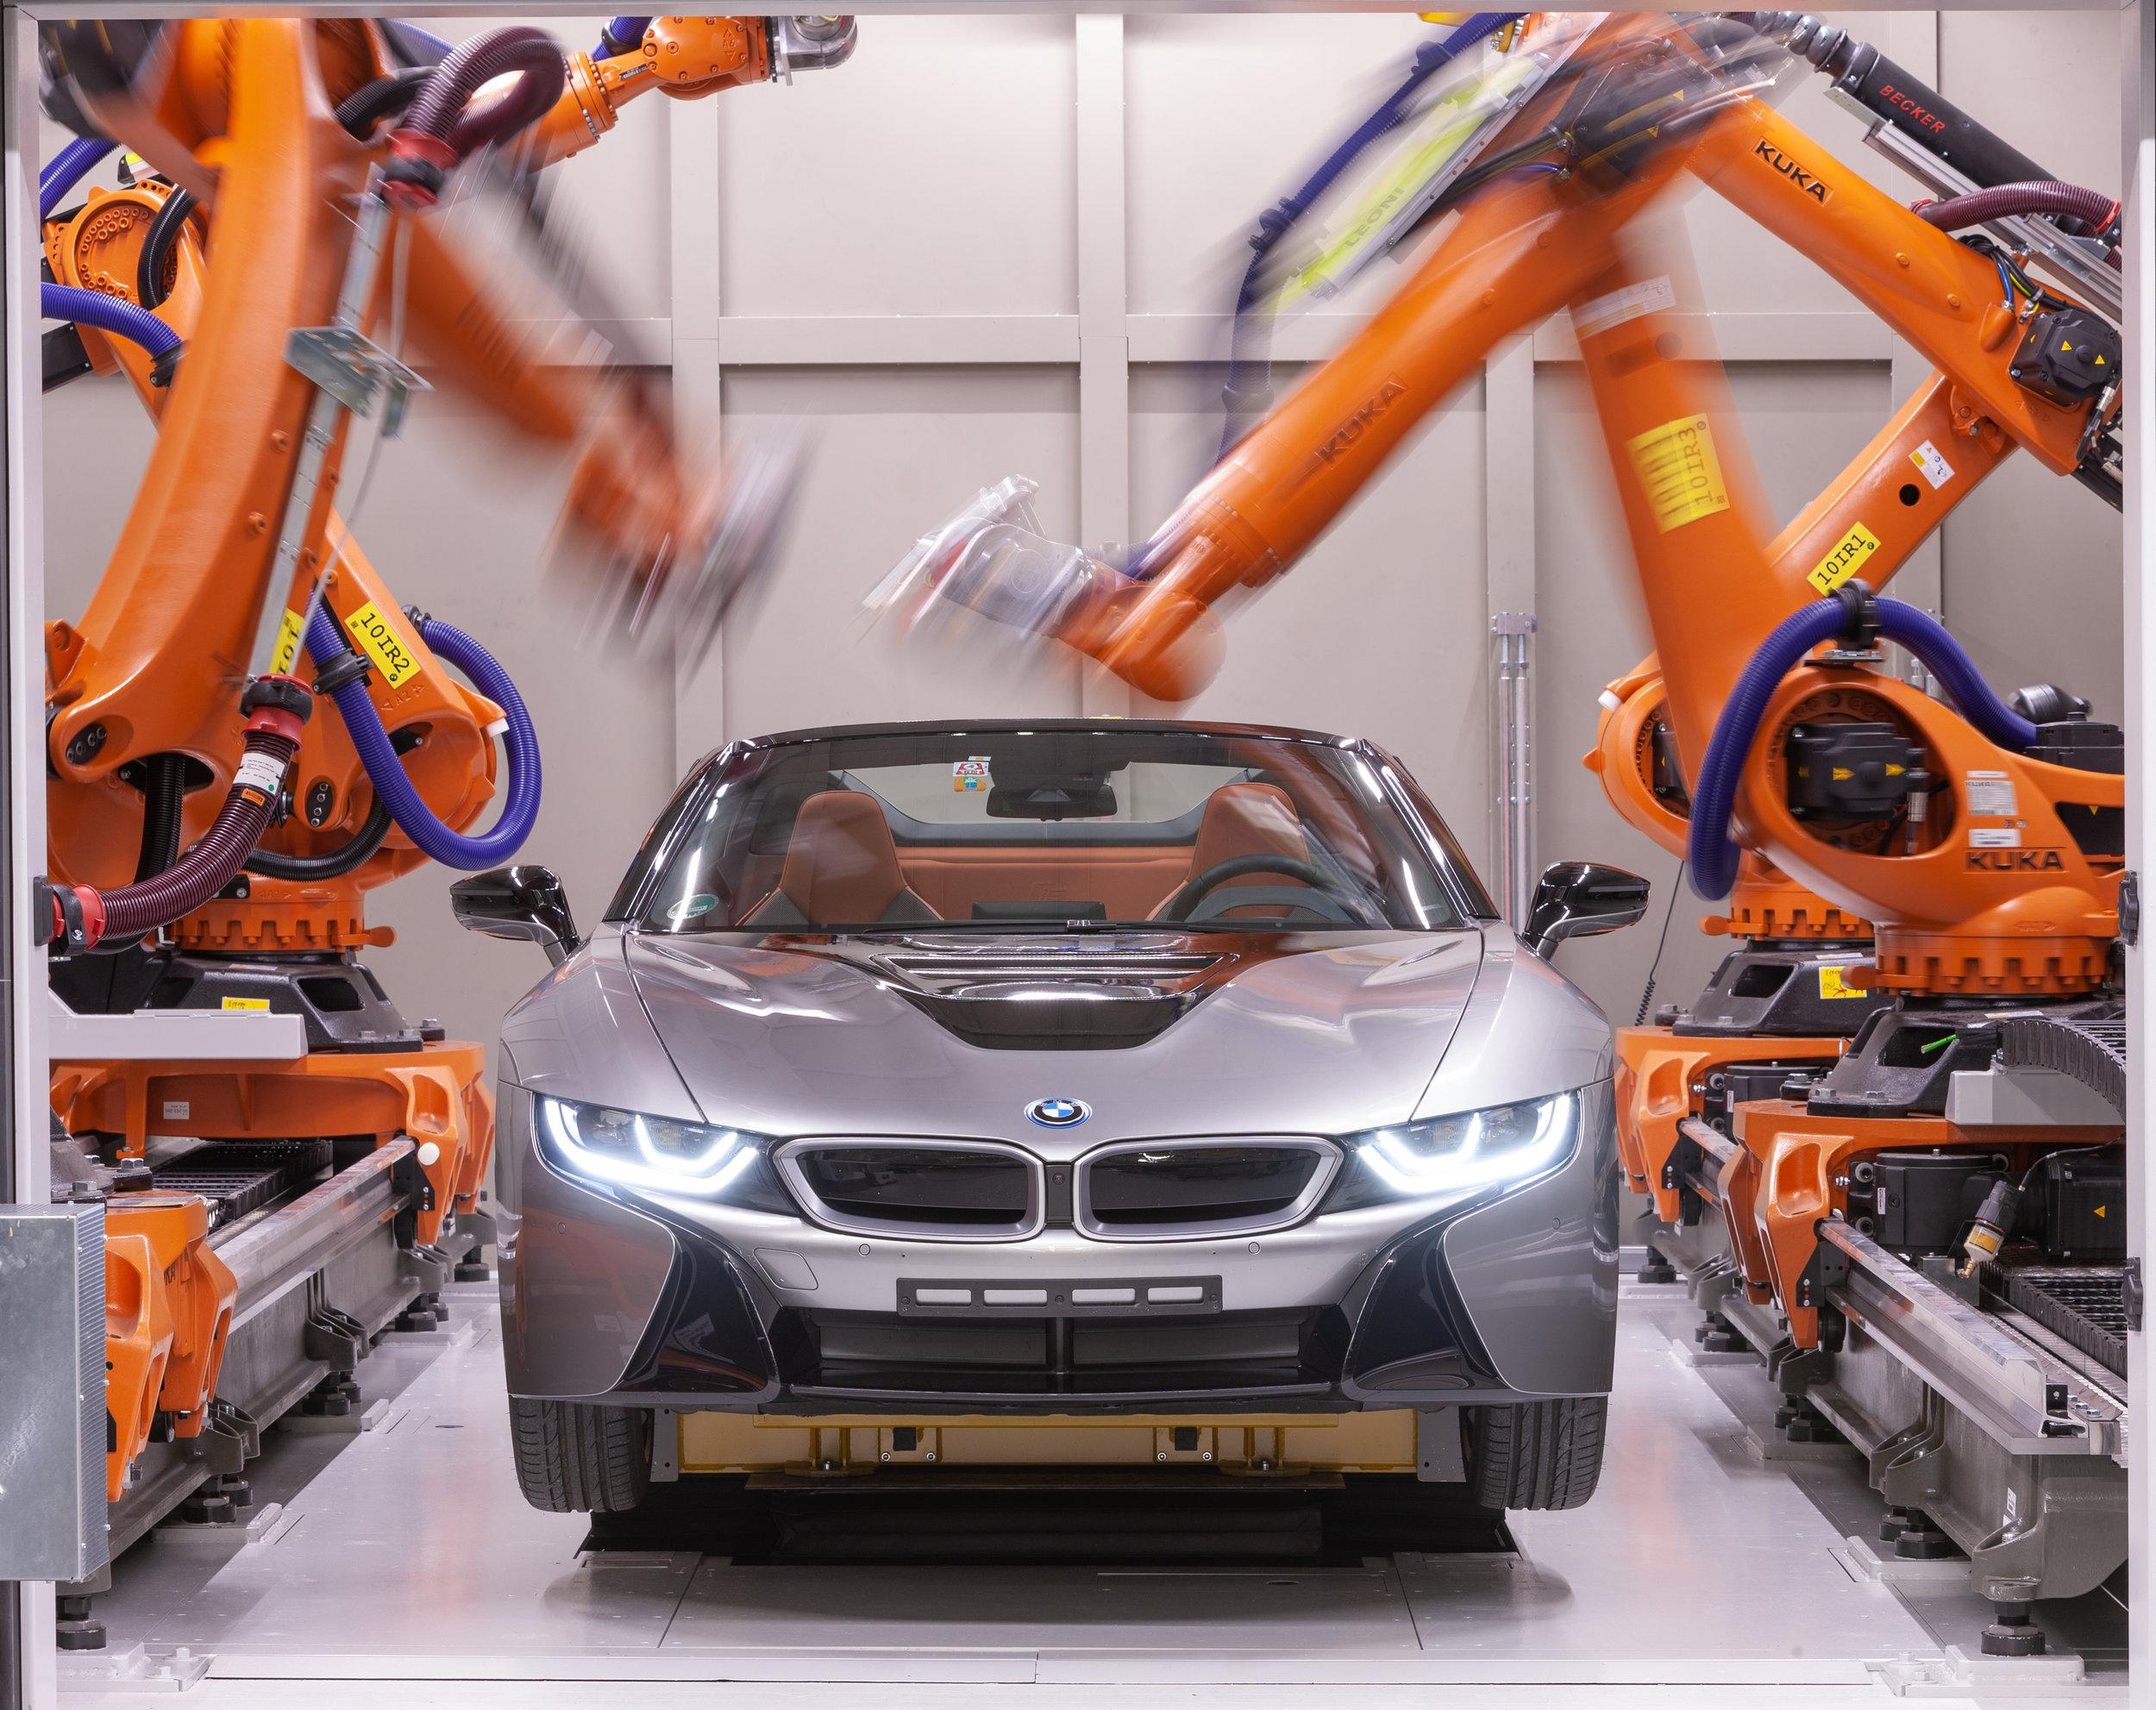 BMW CT scanner 1.jpg